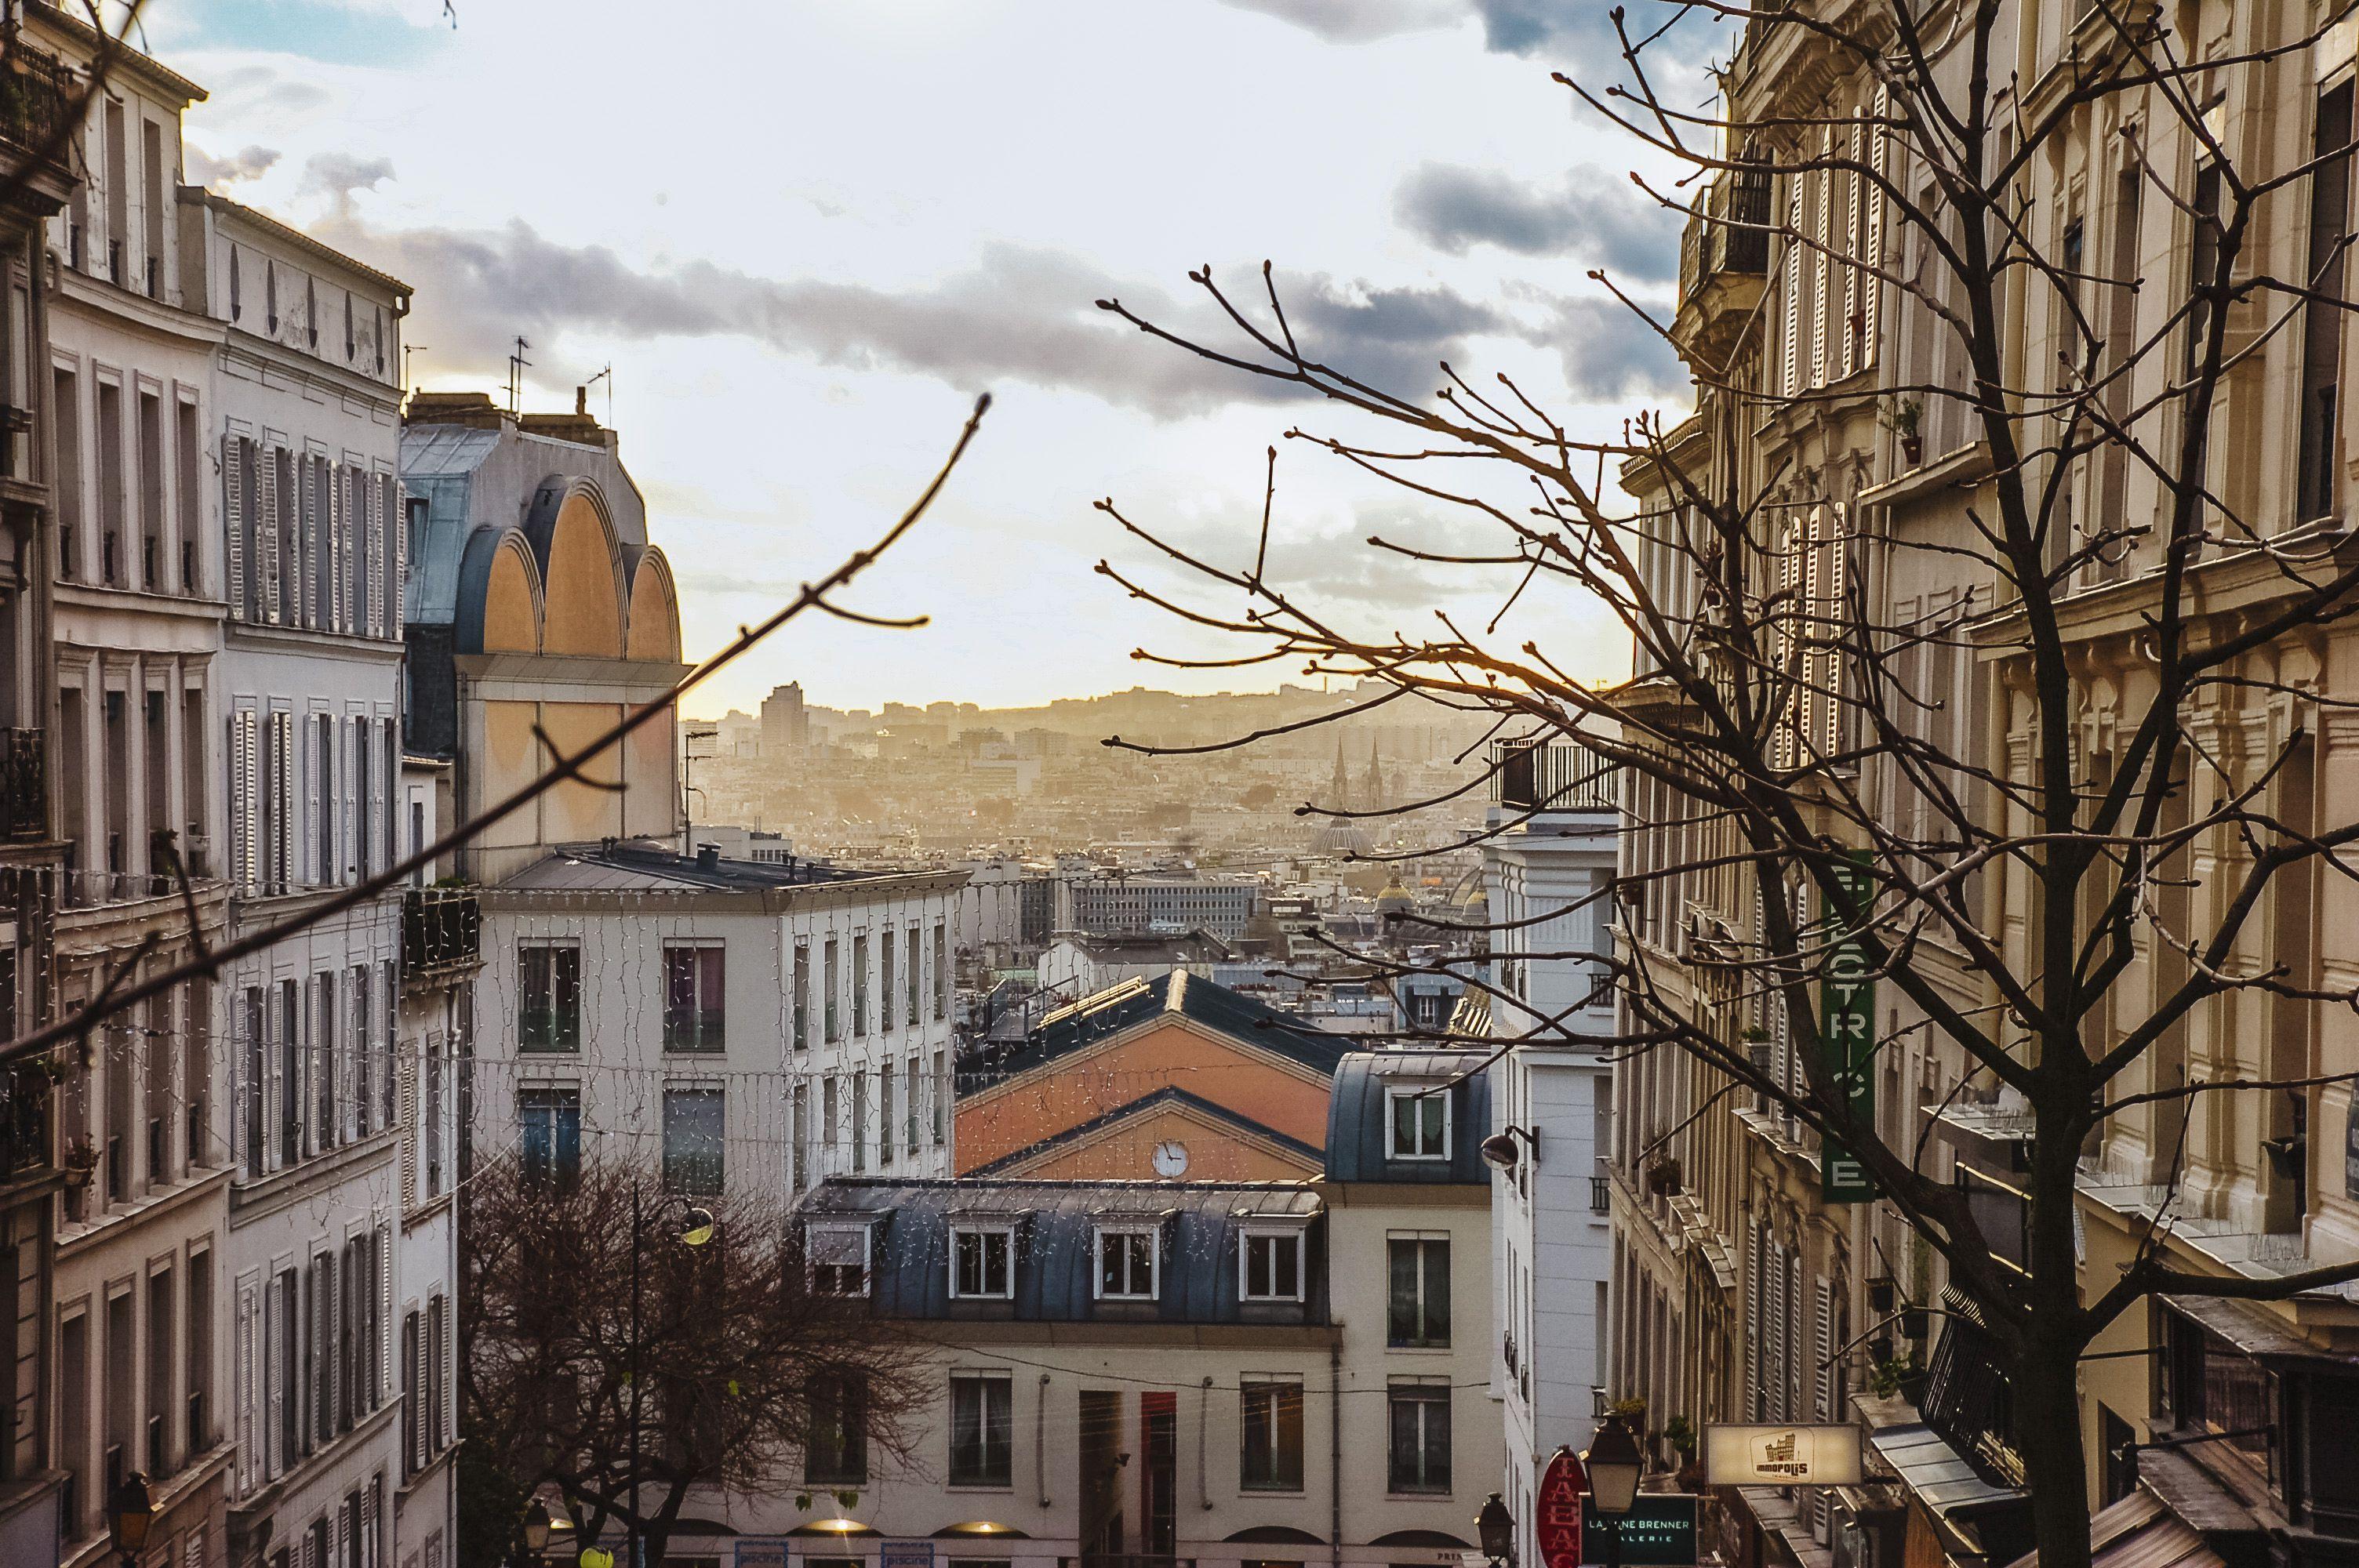 Buildings in Montmarte